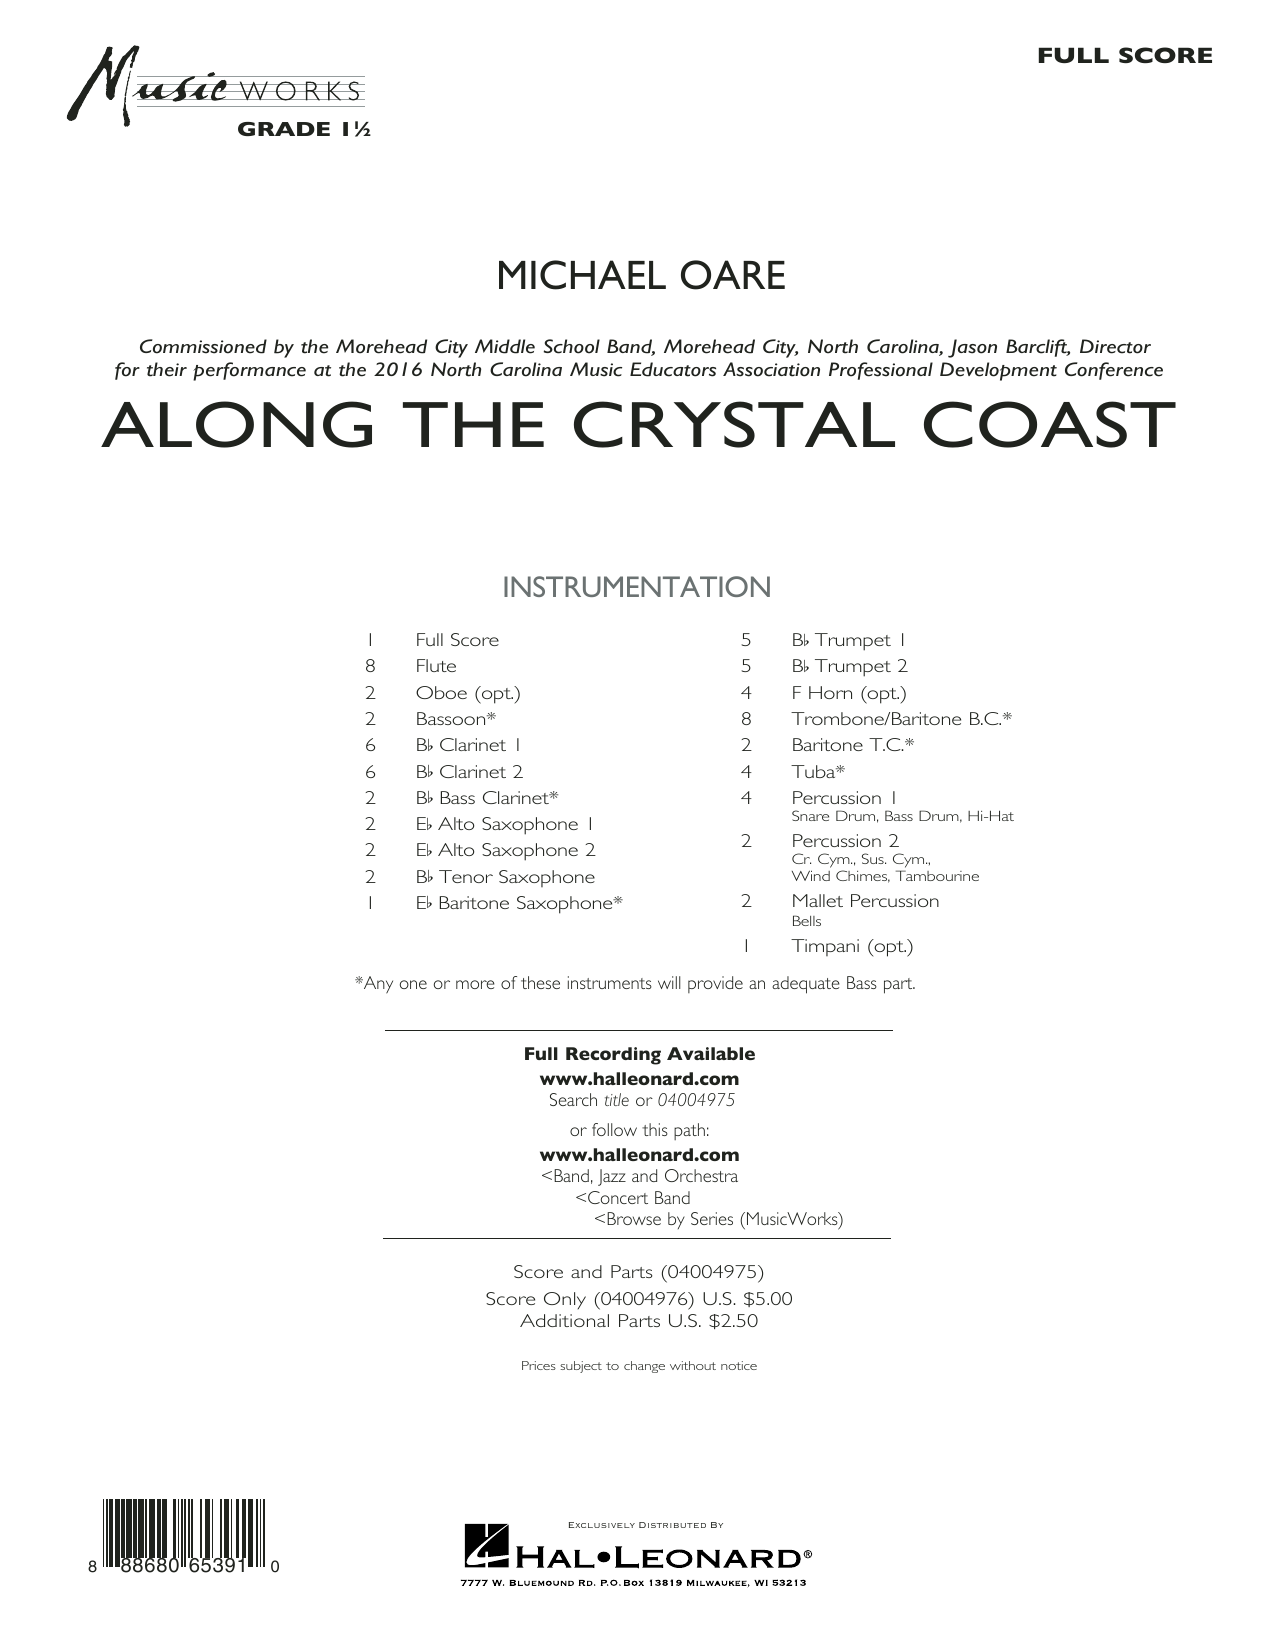 Along the Crystal Coast - Conductor Score (Full Score) Sheet Music